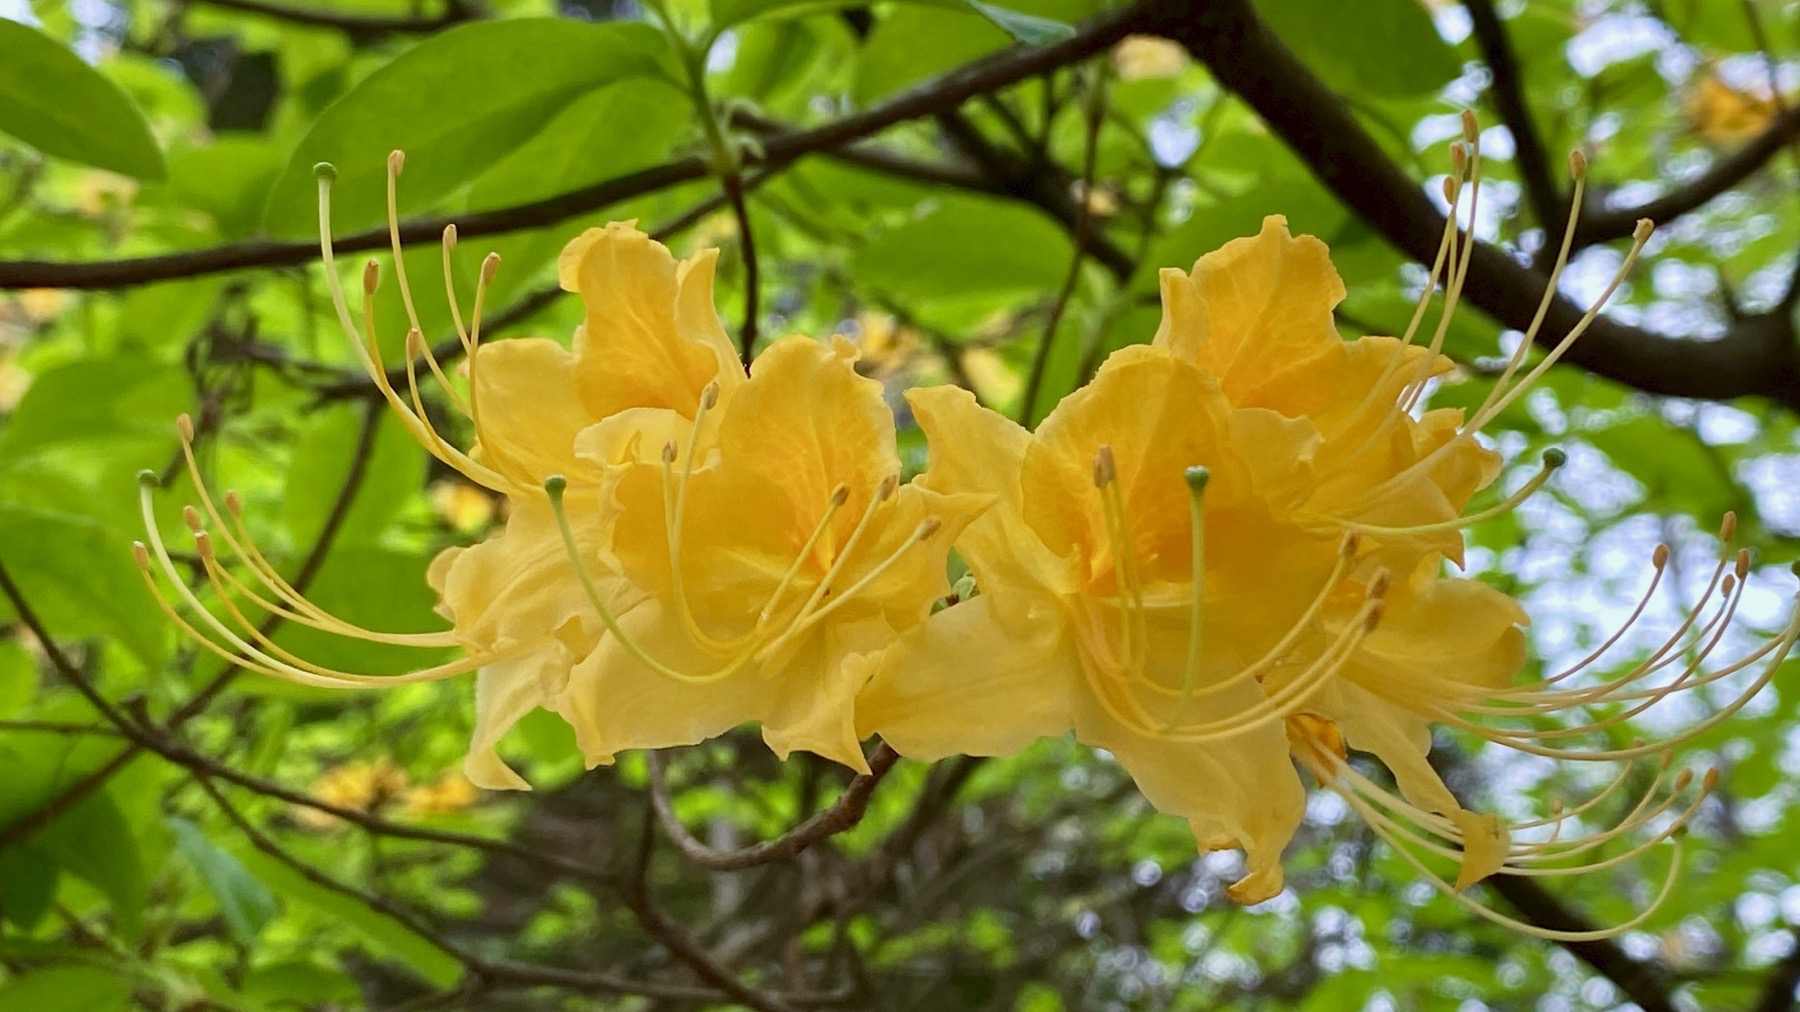 Leafing azalea